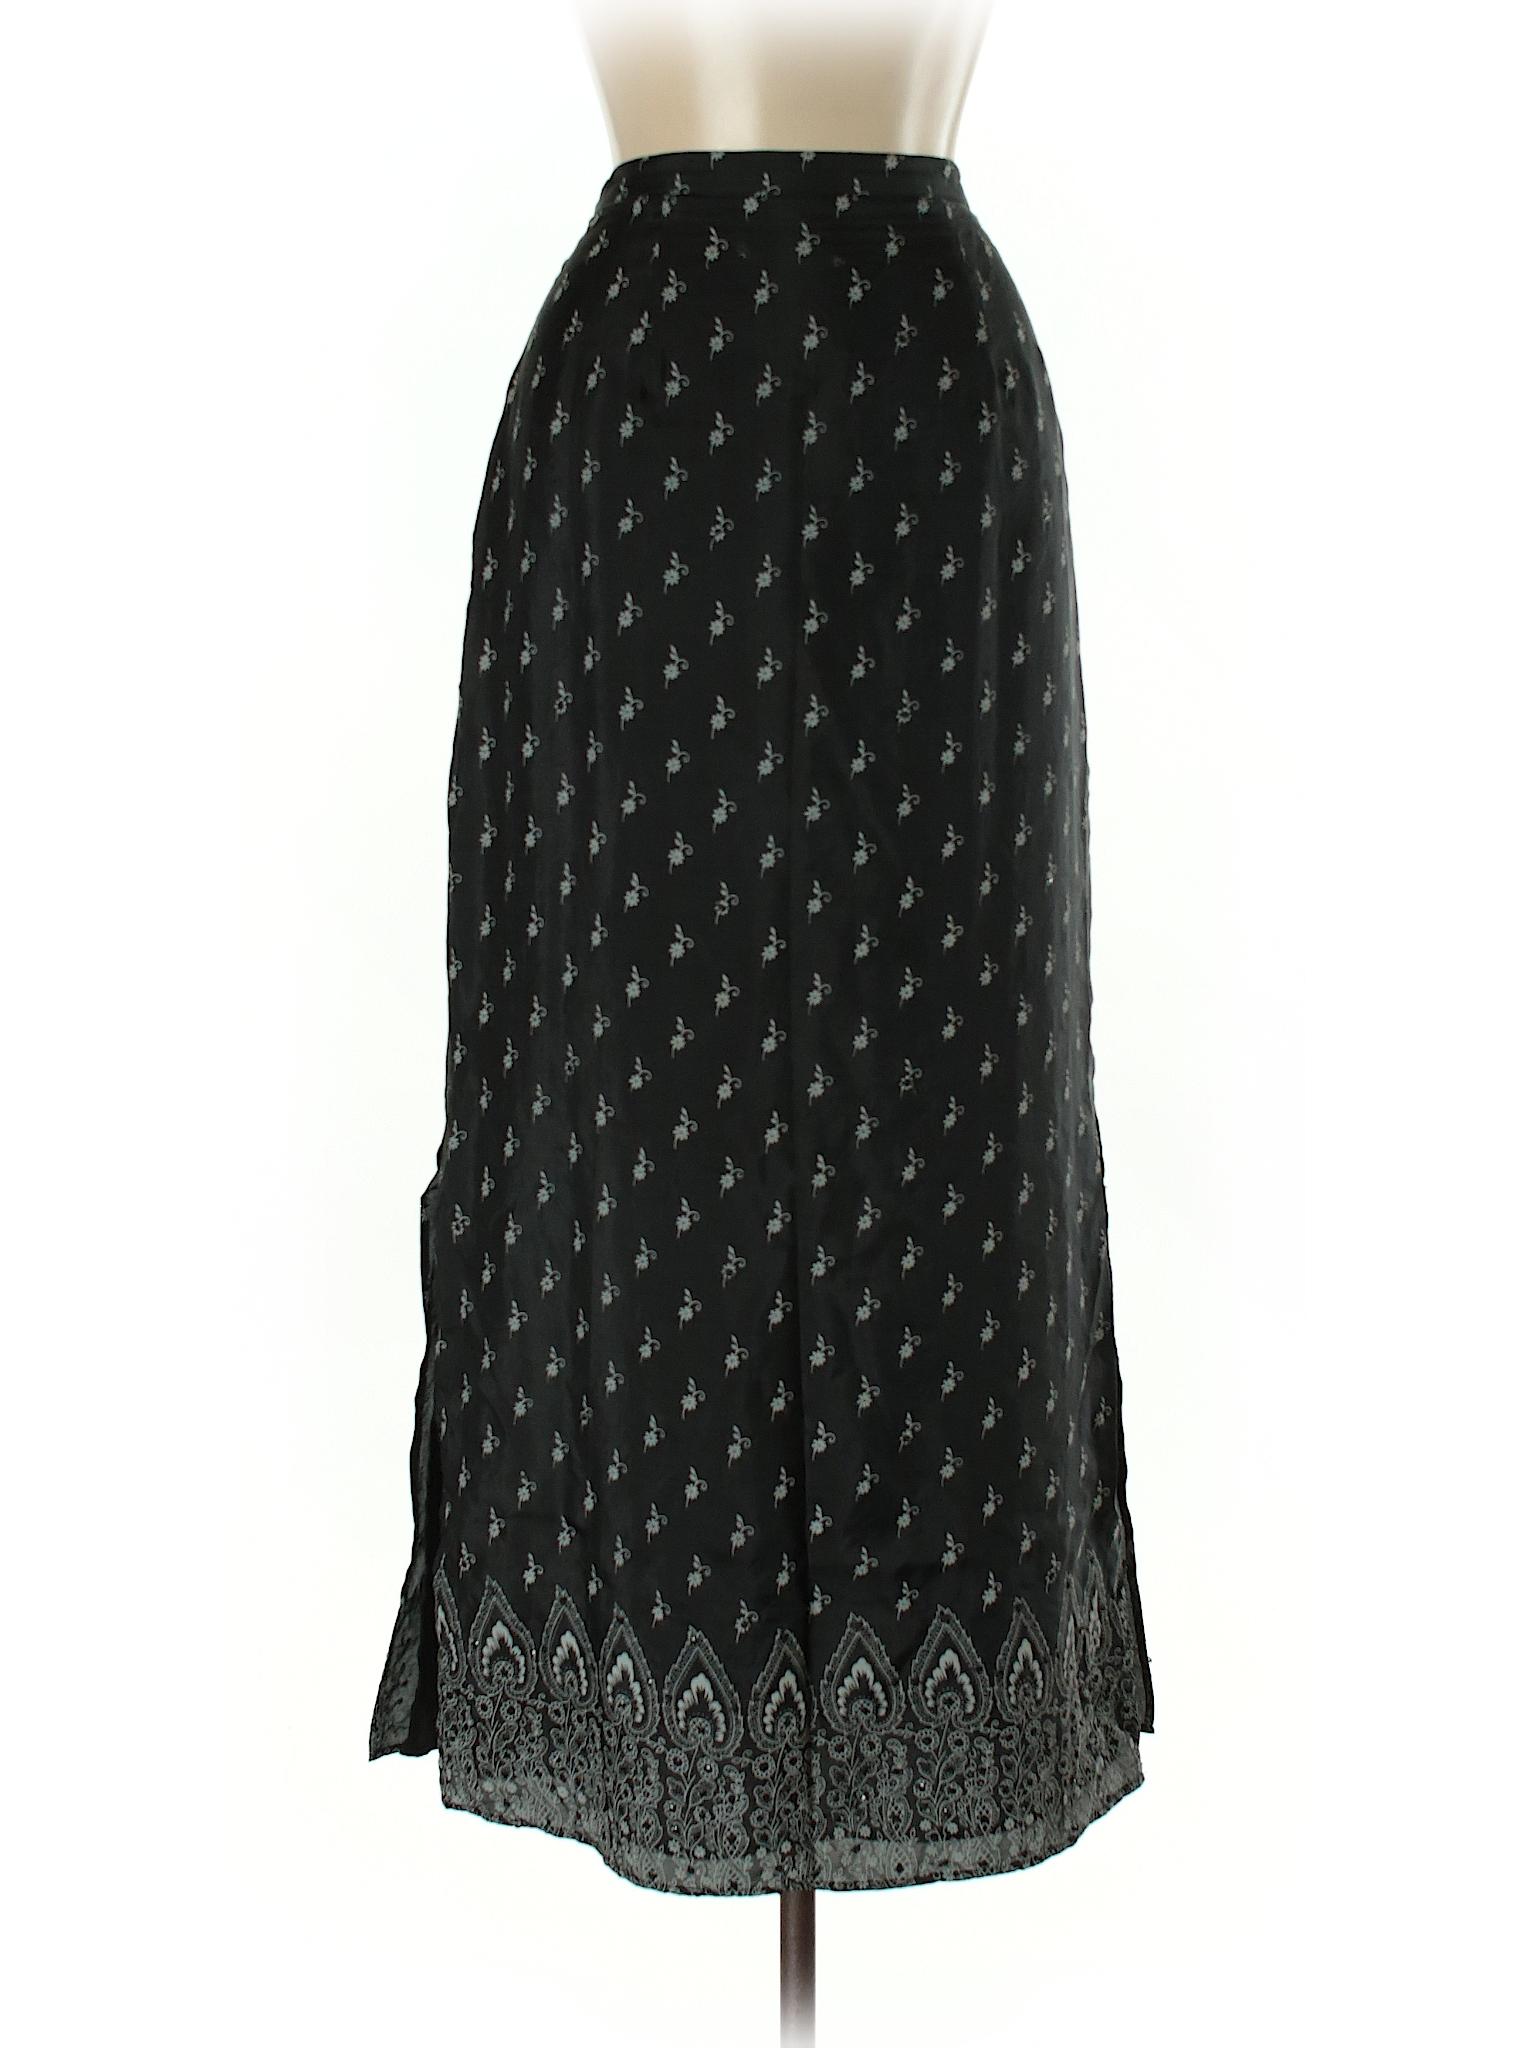 Boutique Harold's Harold's Boutique Skirt Silk Silk Skirt r48xqzwr